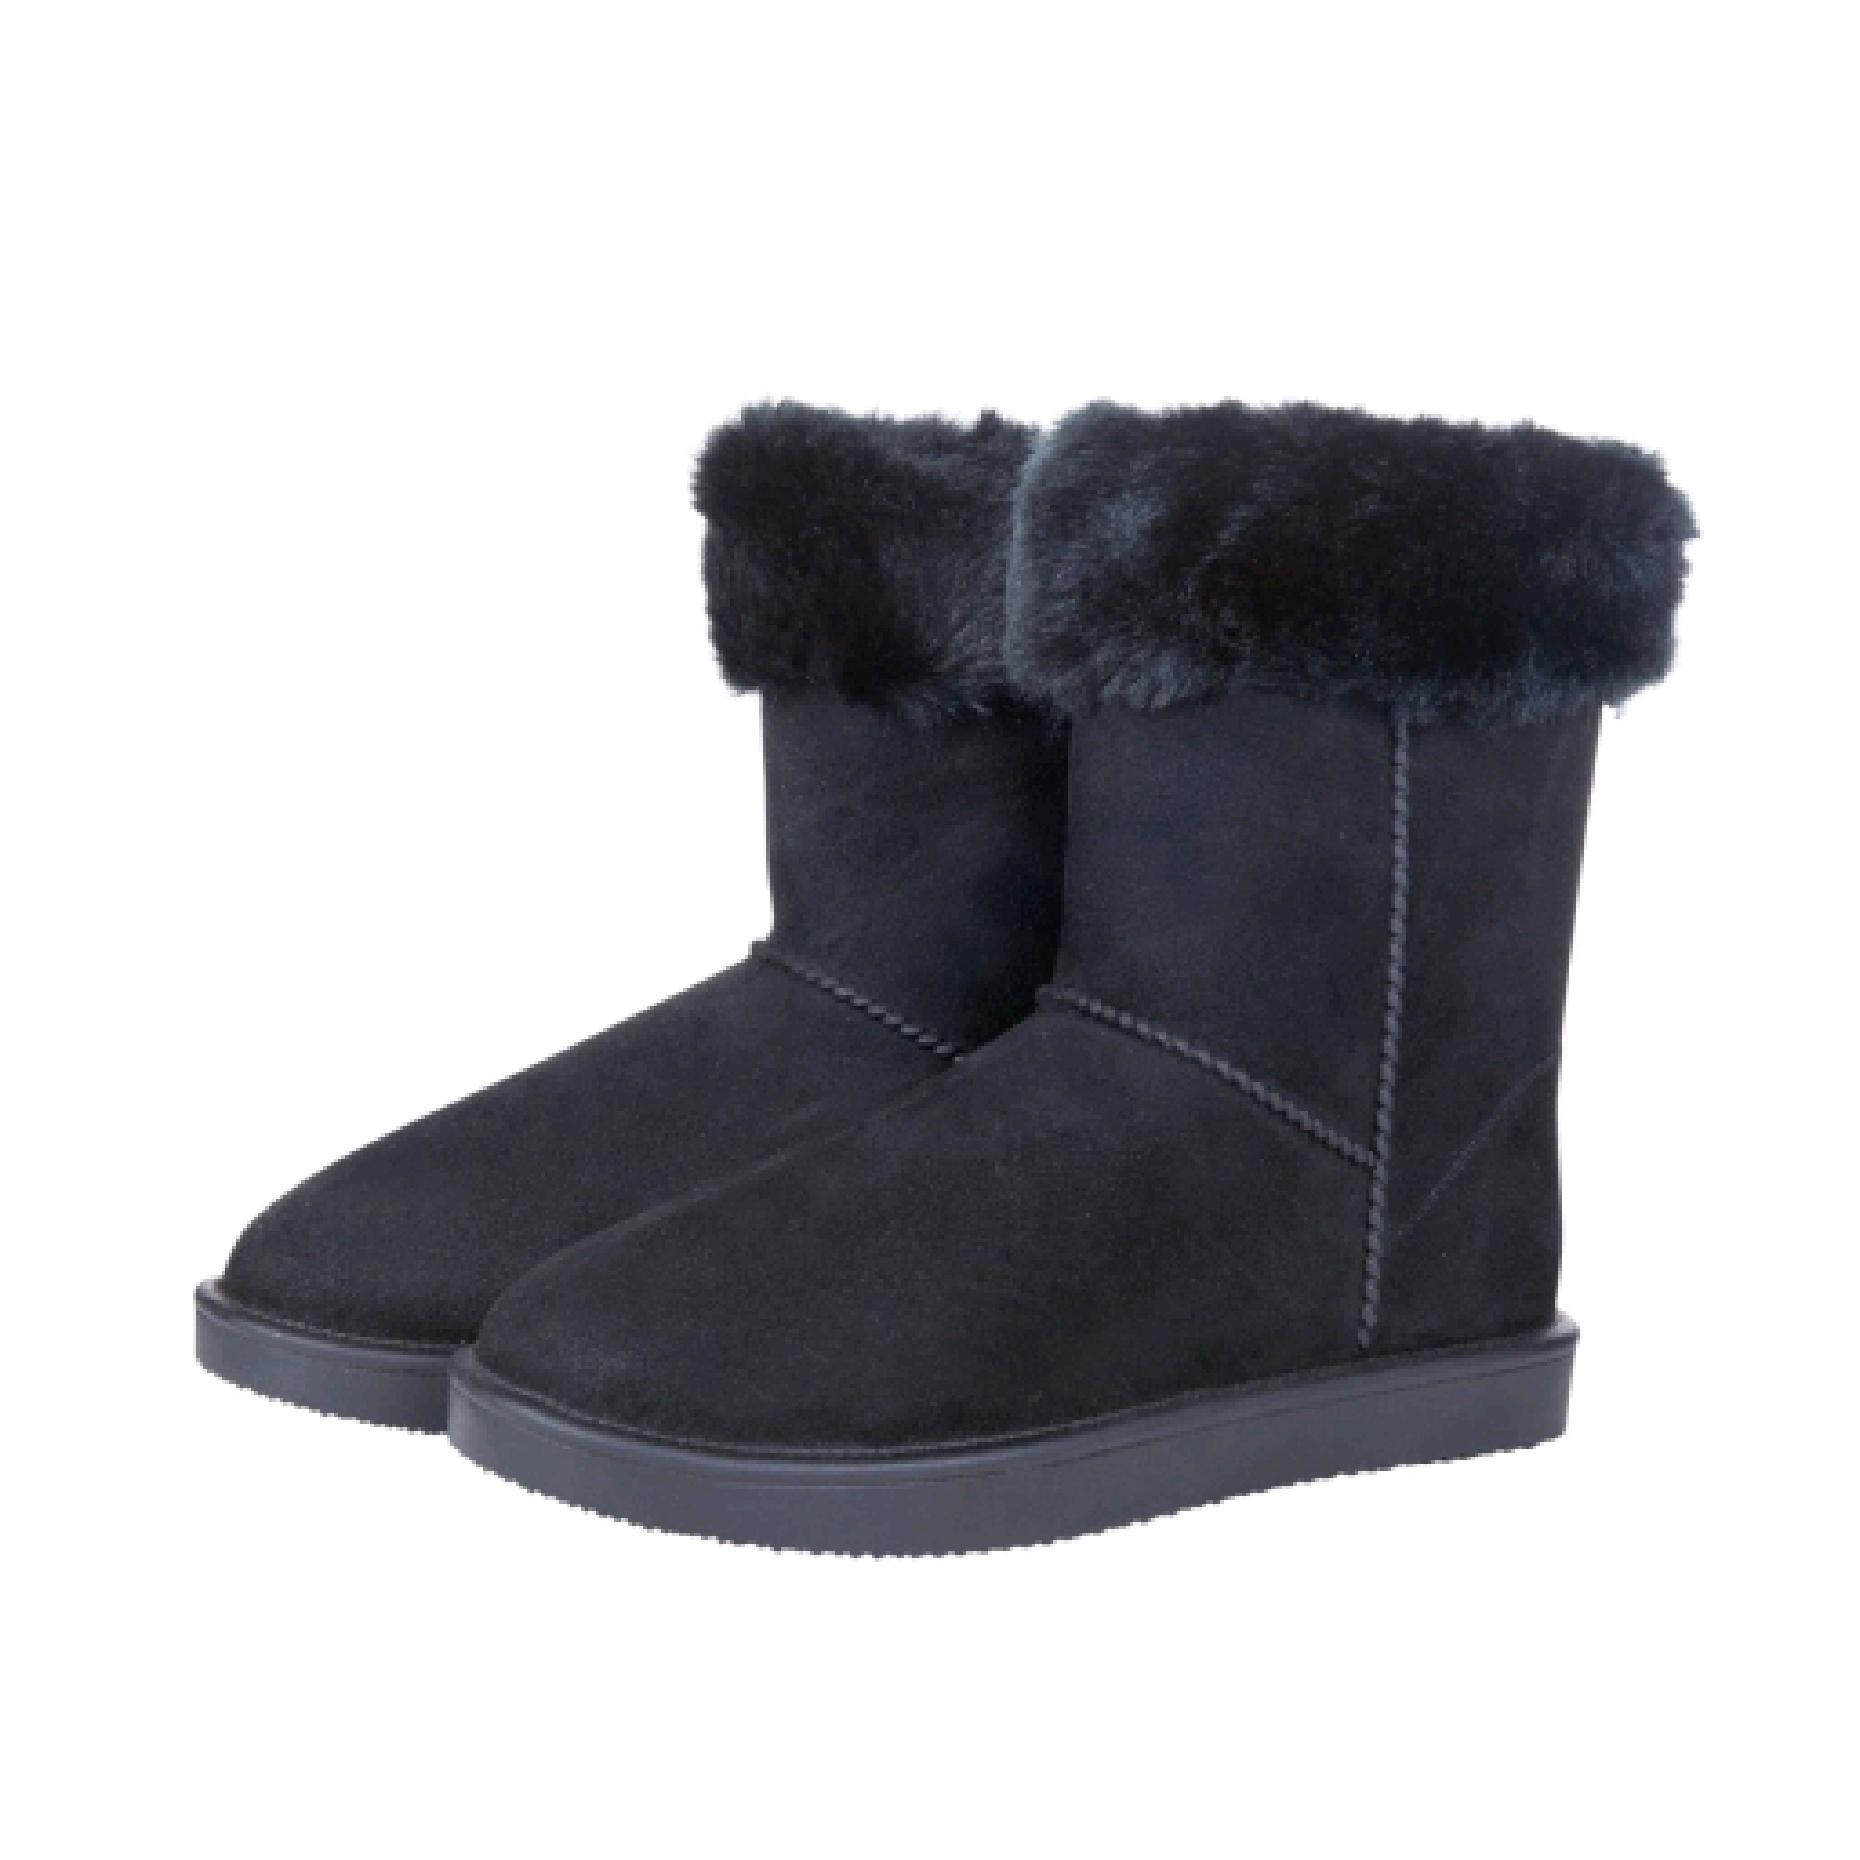 HKM Waterproof Fur Lined Boots